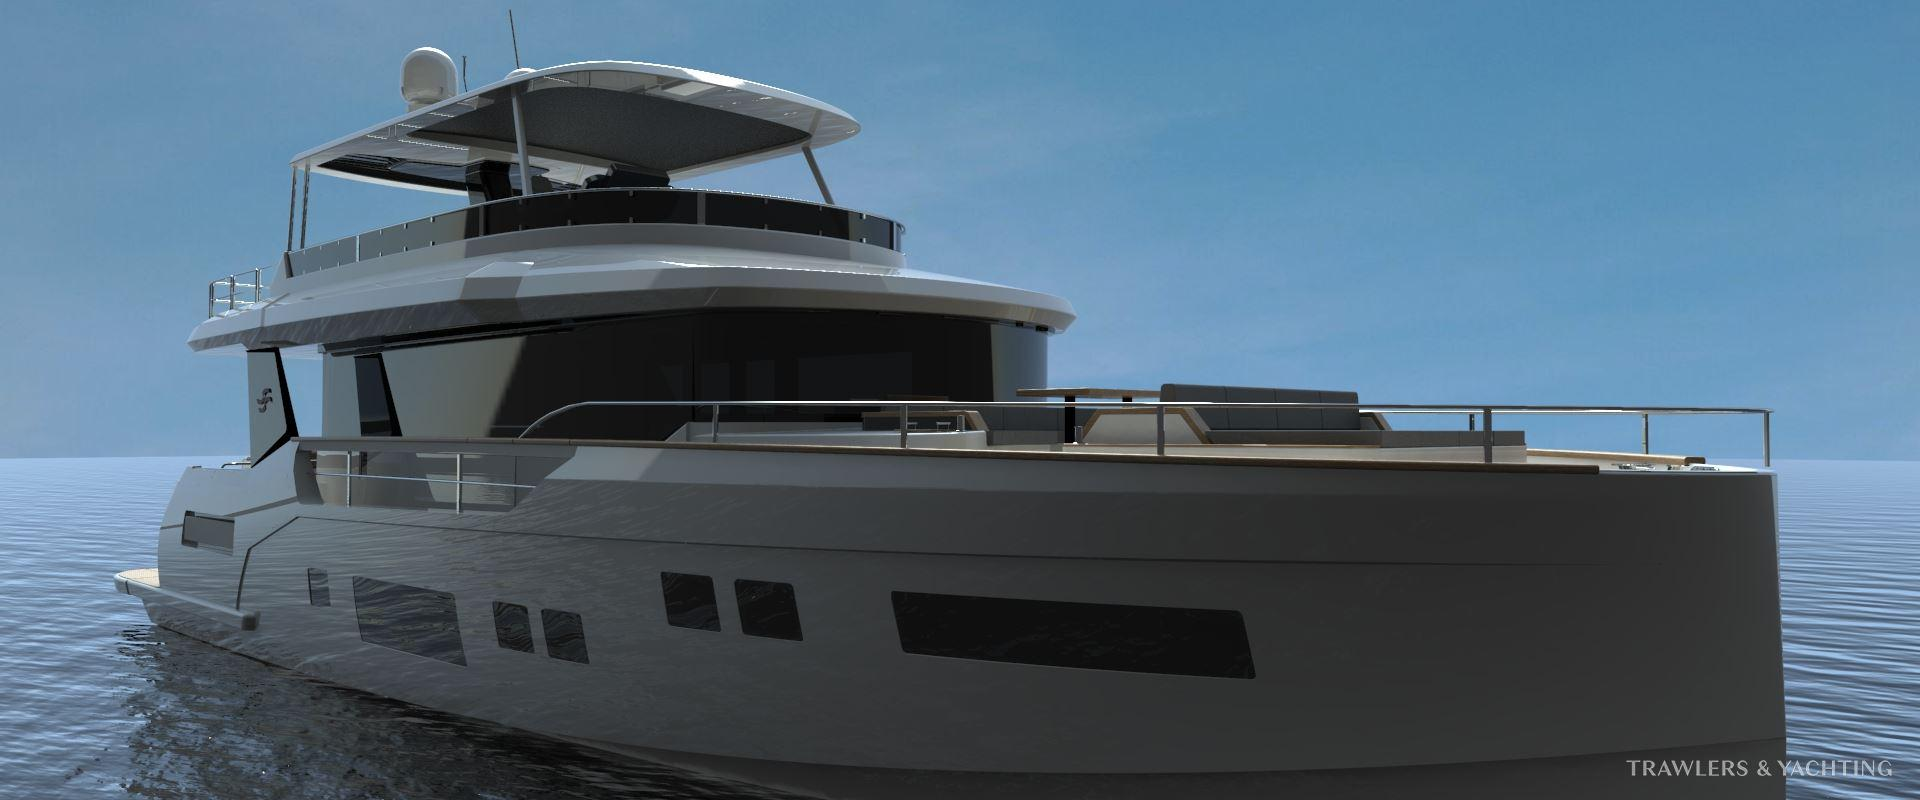 Nouveau Sirena 68 - Trawlers & Yachting - Mandelieu-la-Napoule (06)